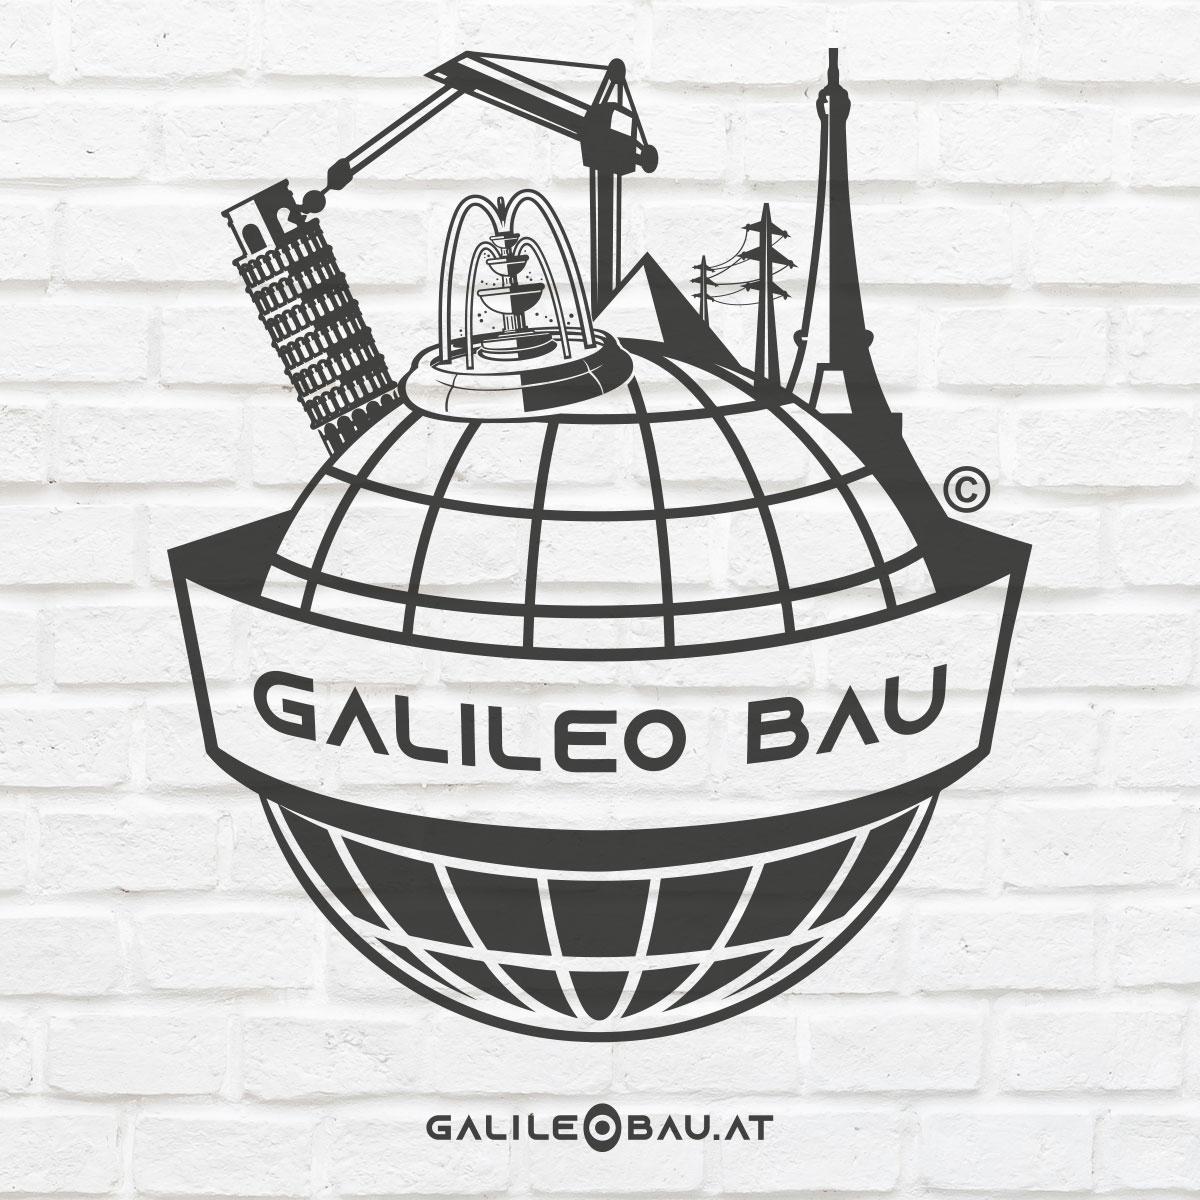 galileo-bau_01